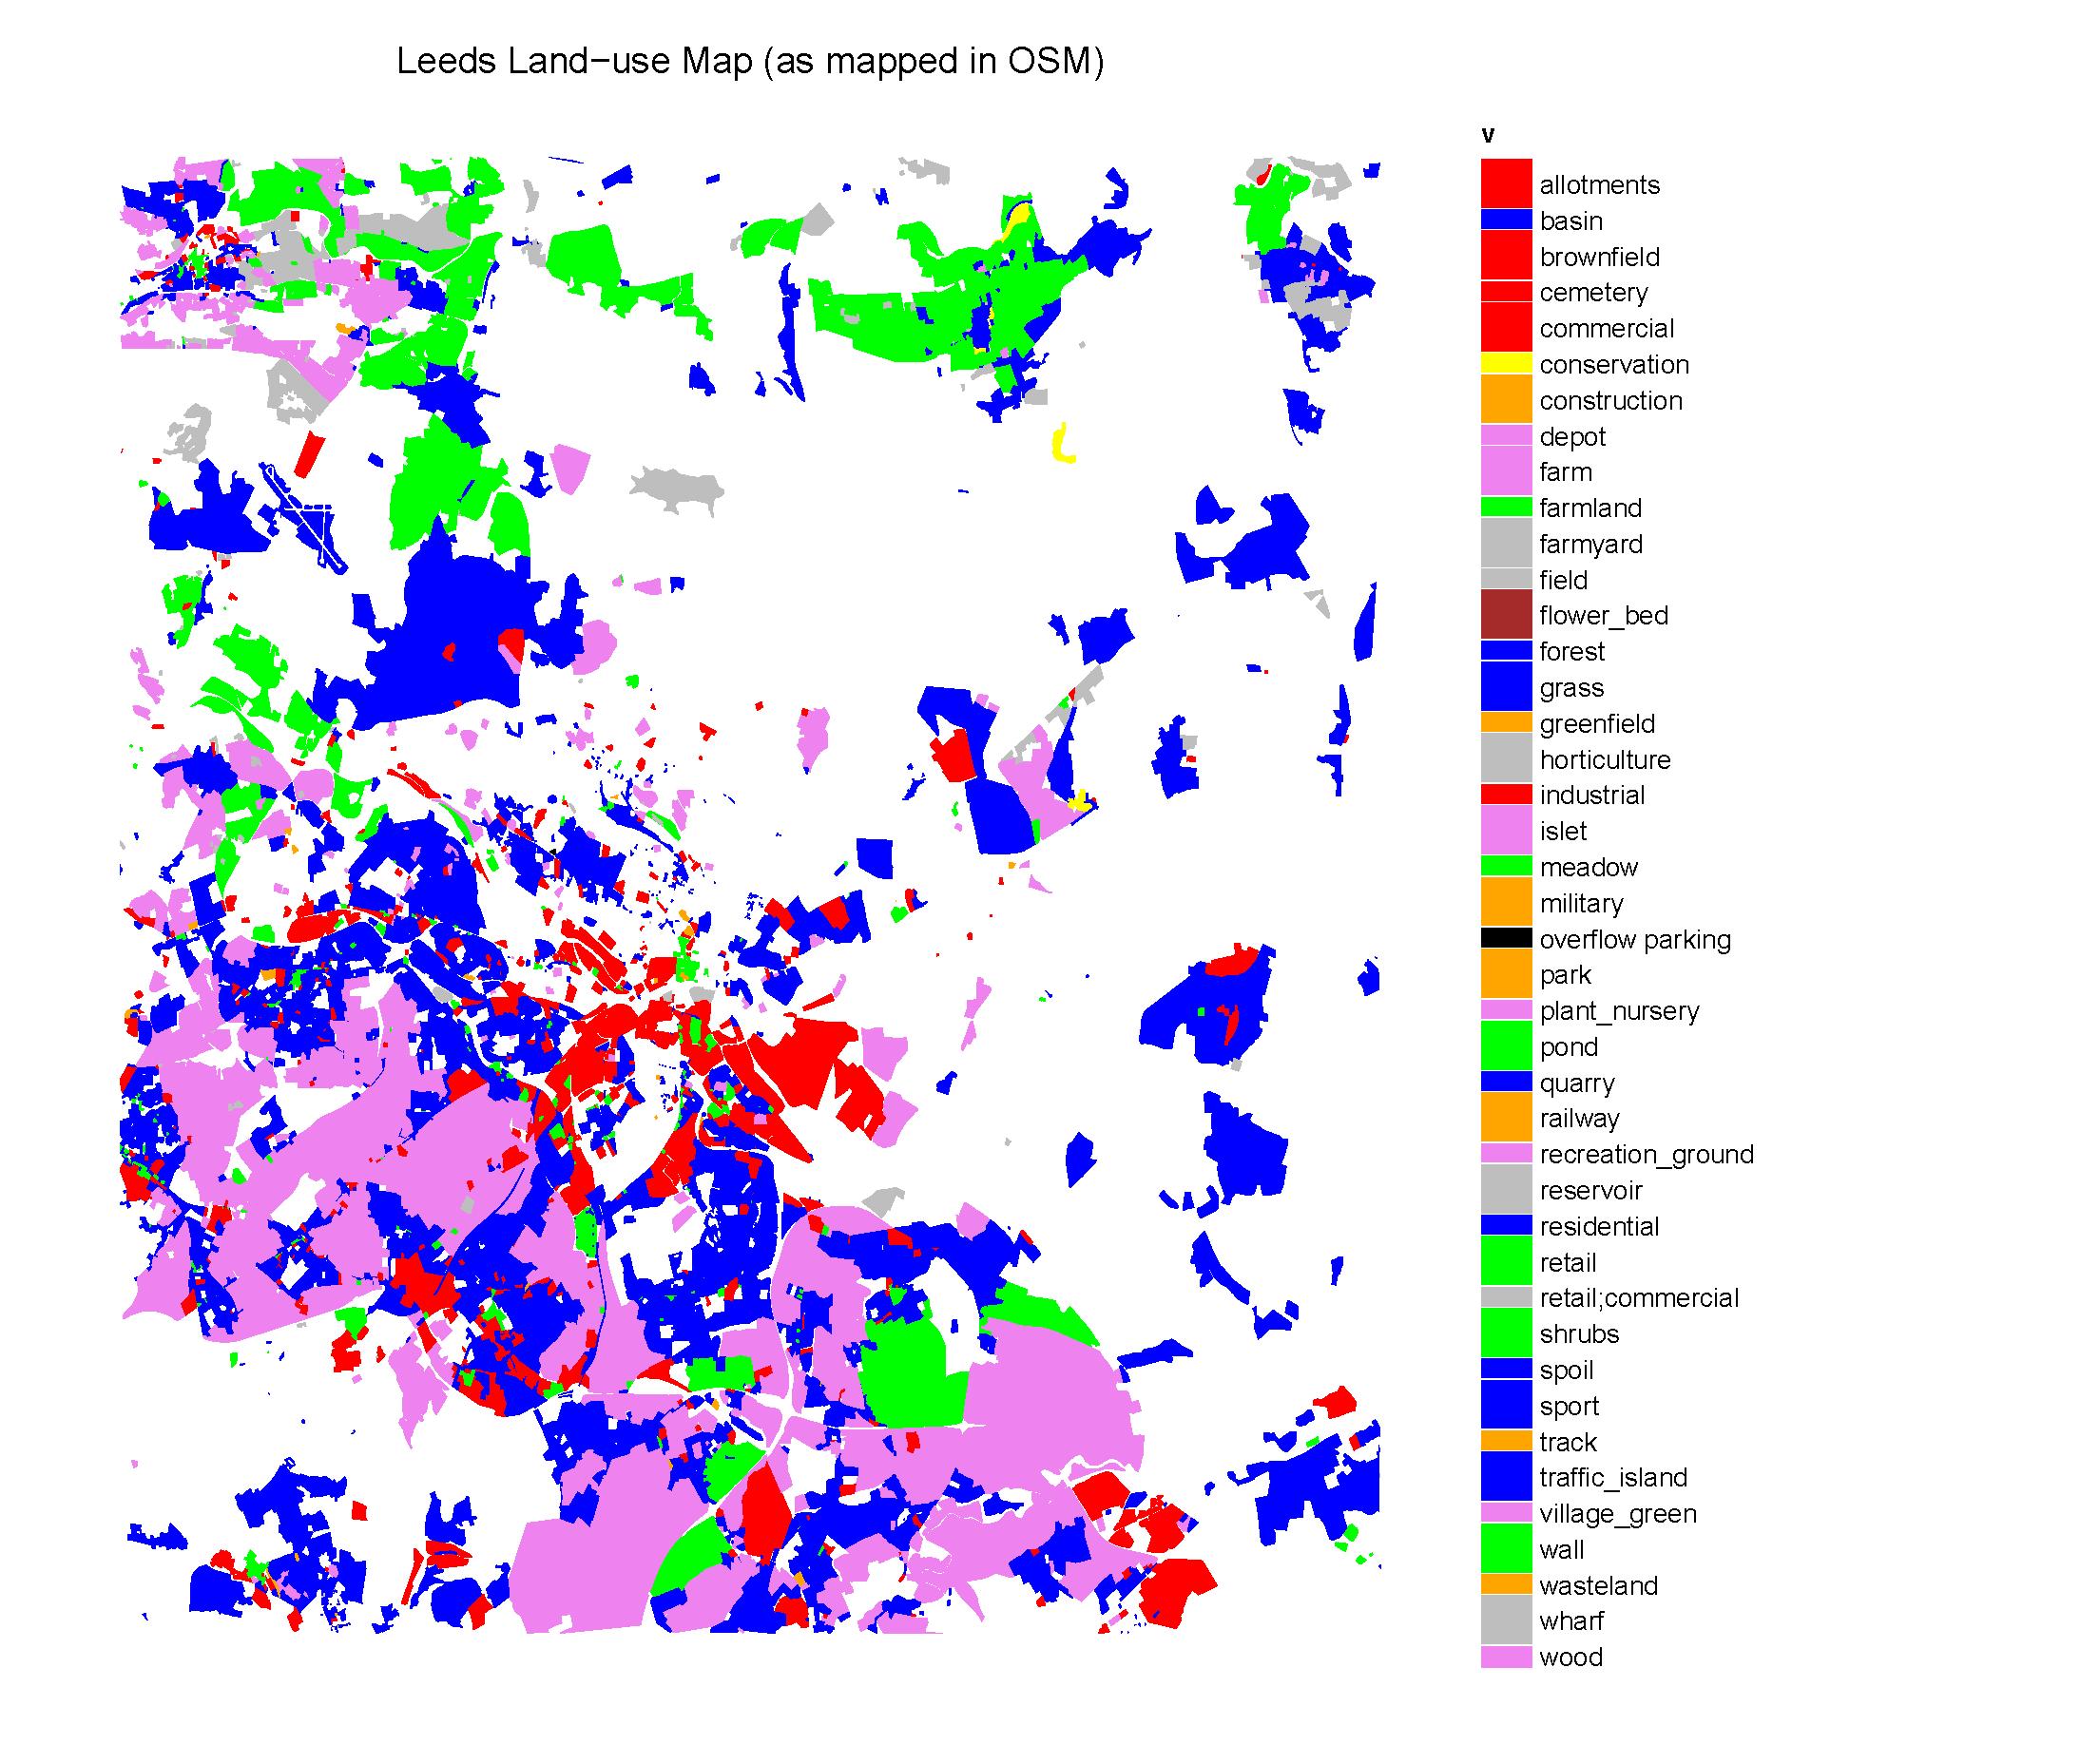 Leeds - Land Use Map - Draft